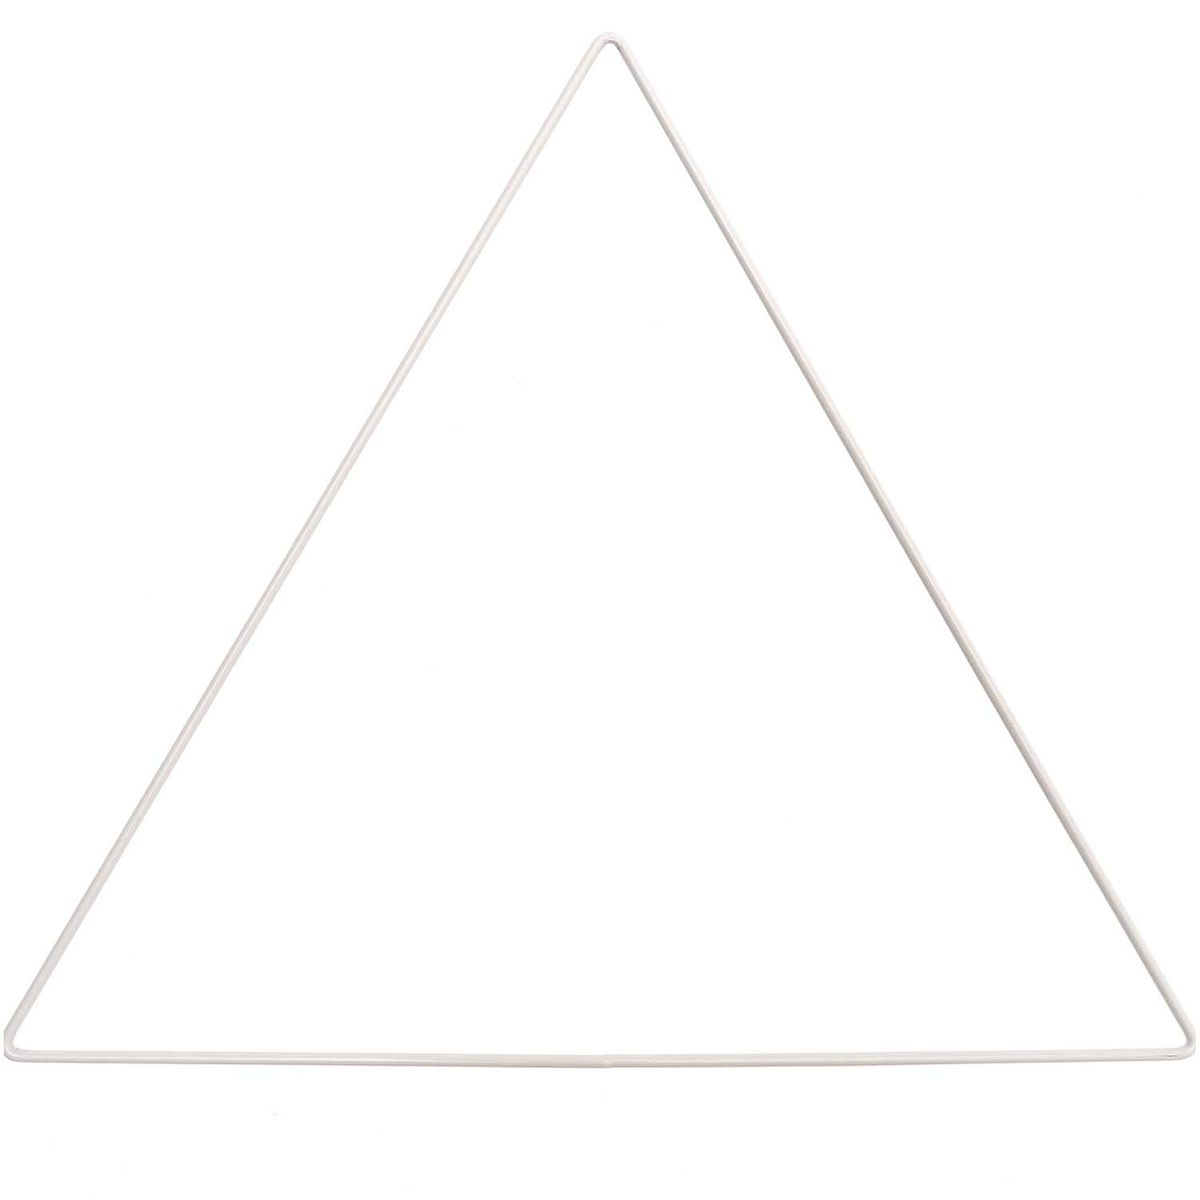 Triangle en métal blanc pour attrape-rêves